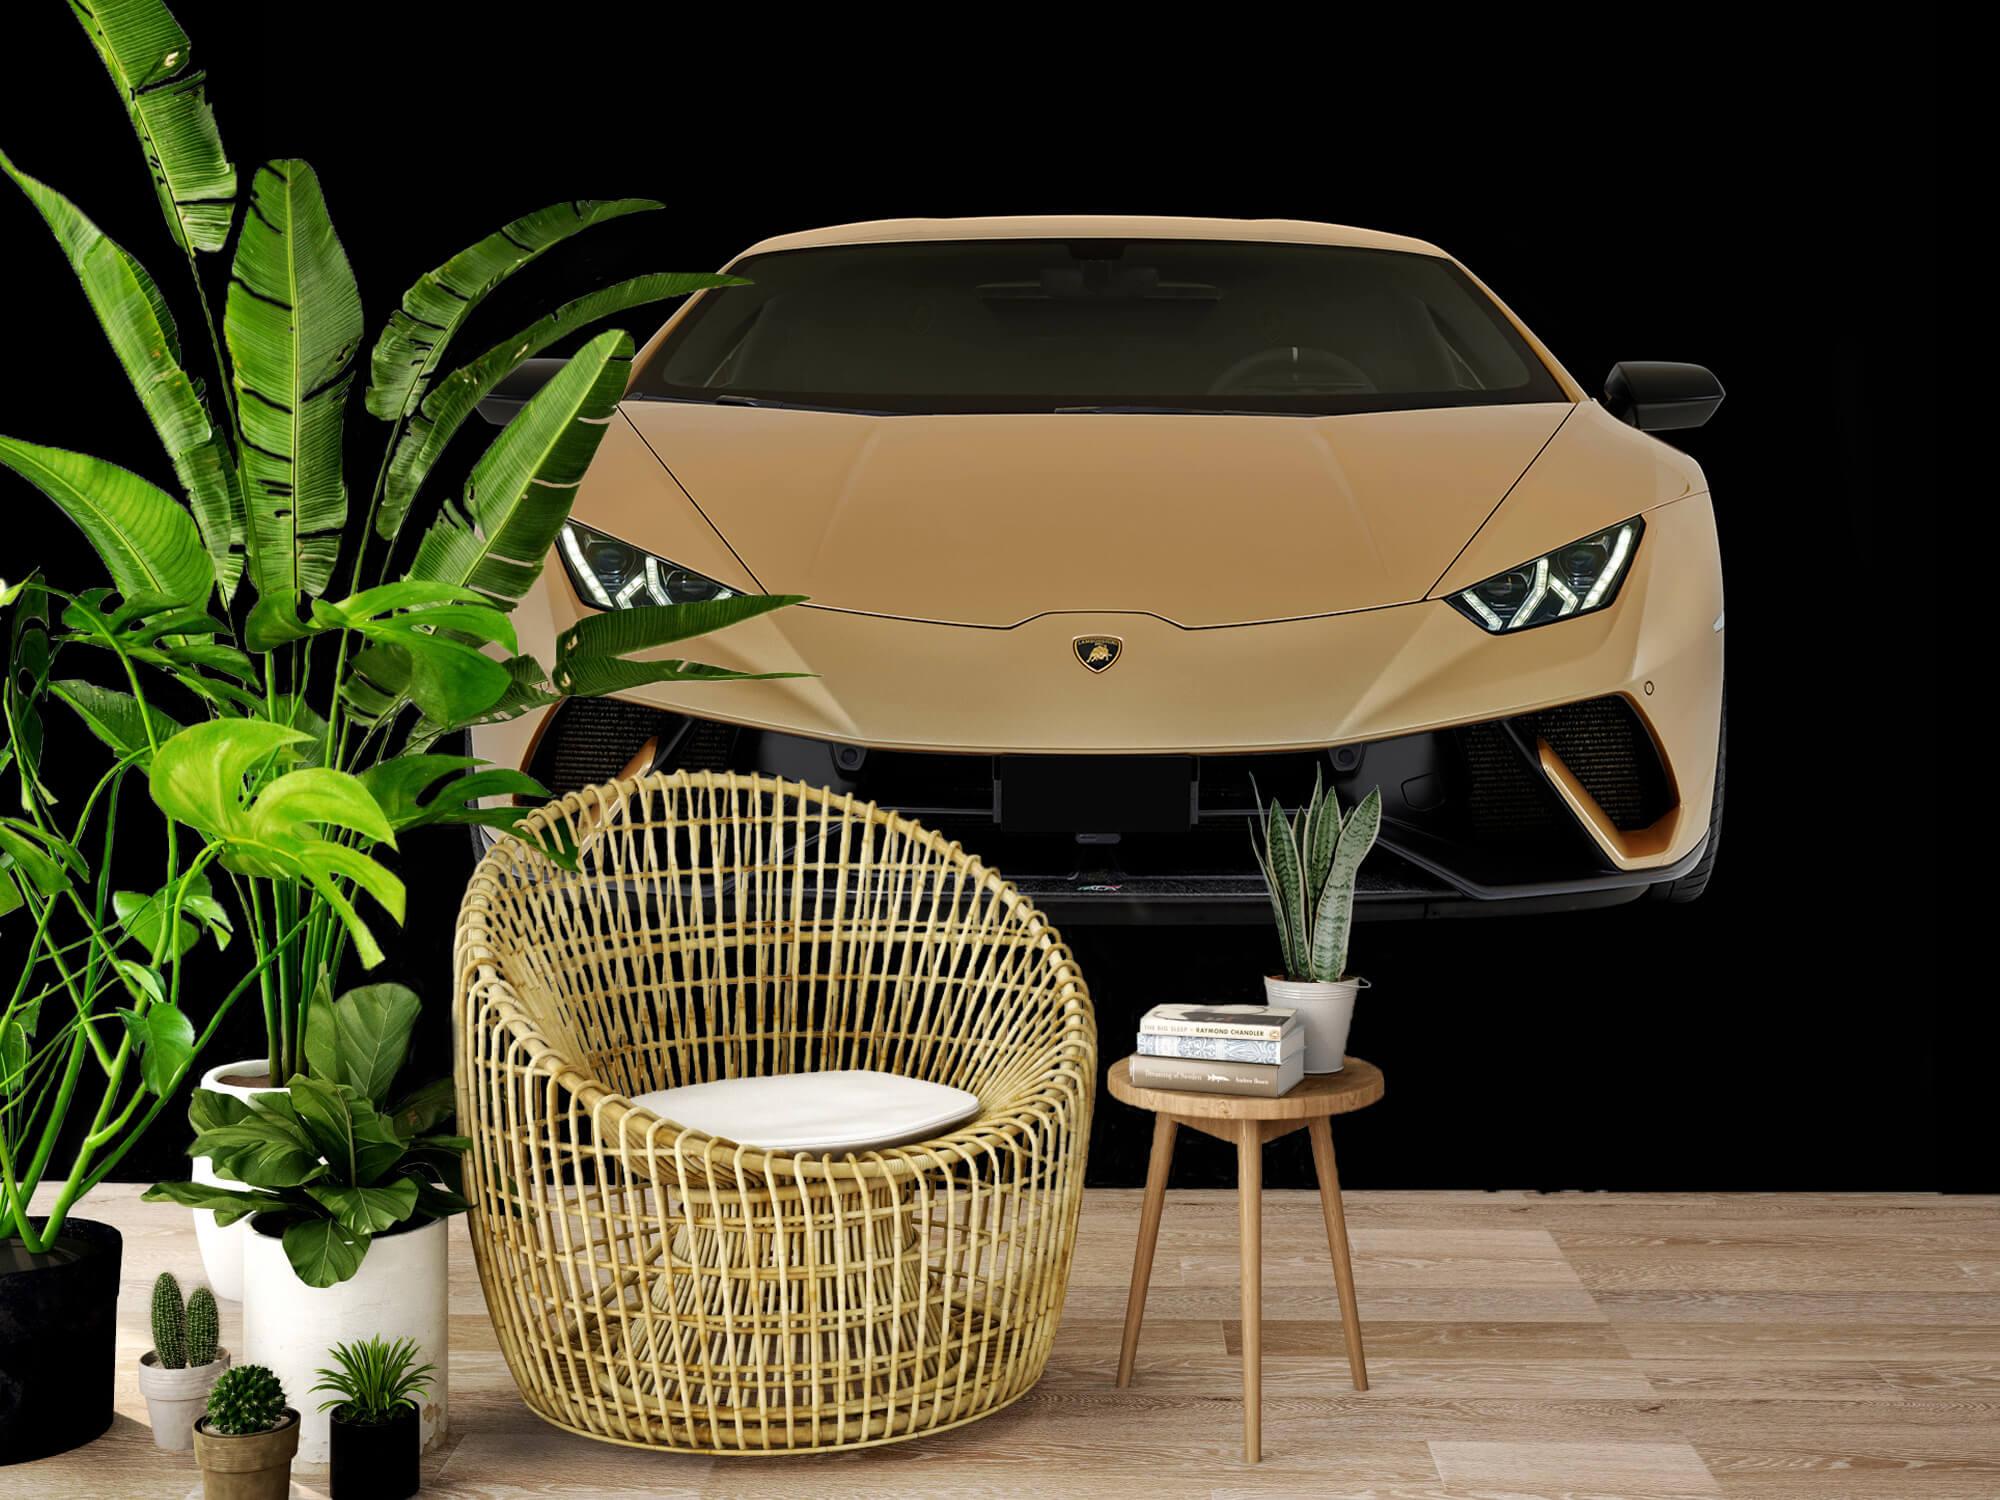 Wallpaper Lamborghini Huracán - Voorkant, zwart 7